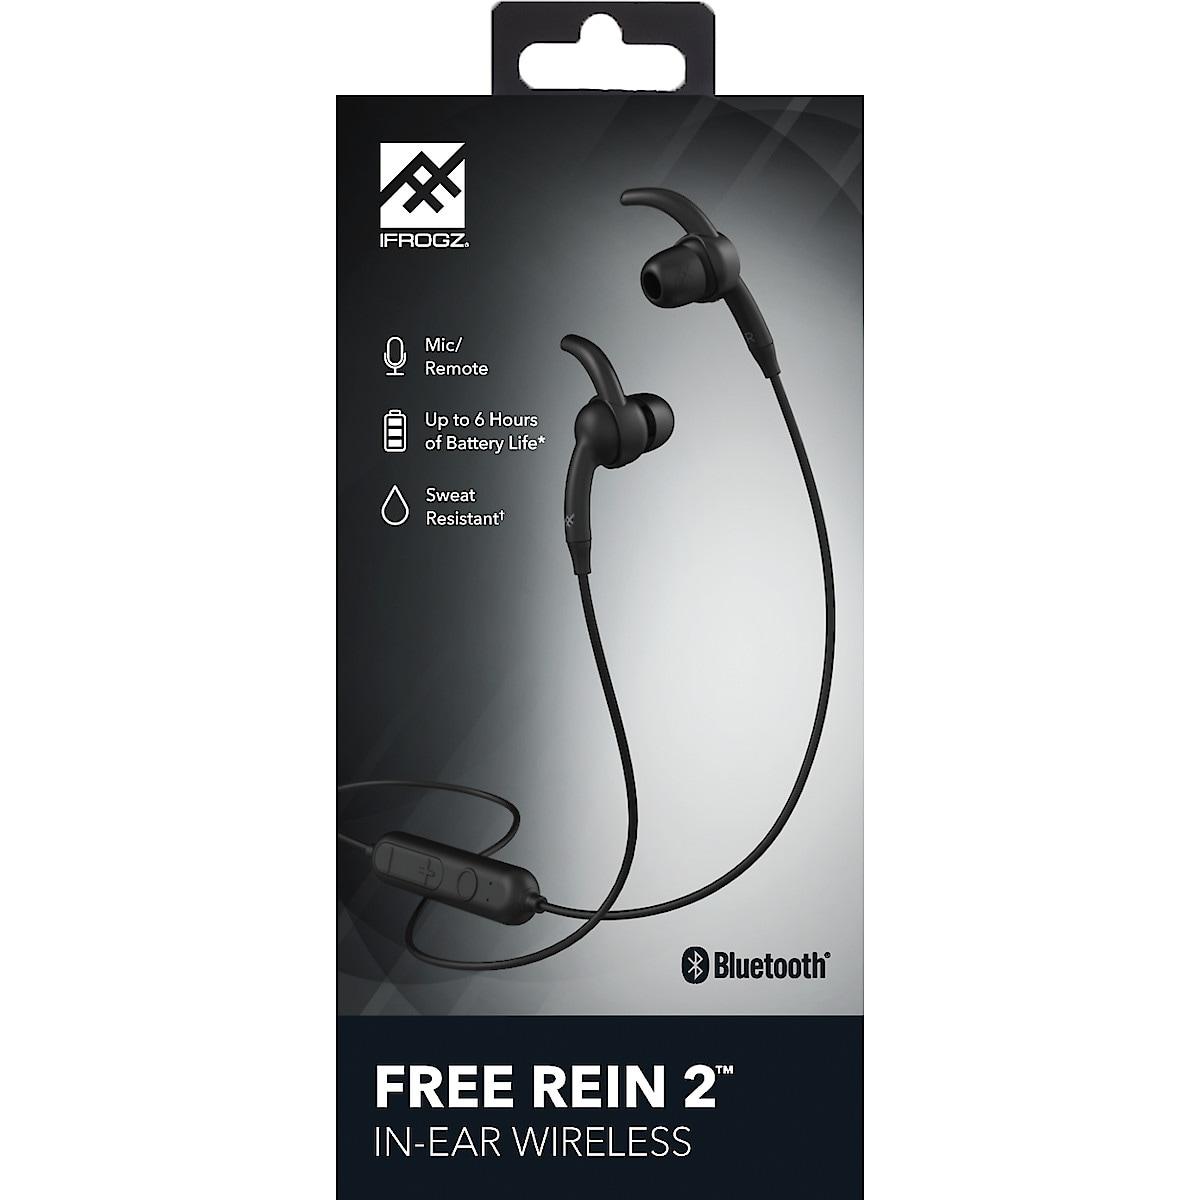 Trådlösa hörlurar, iFrogz Free Rein 2